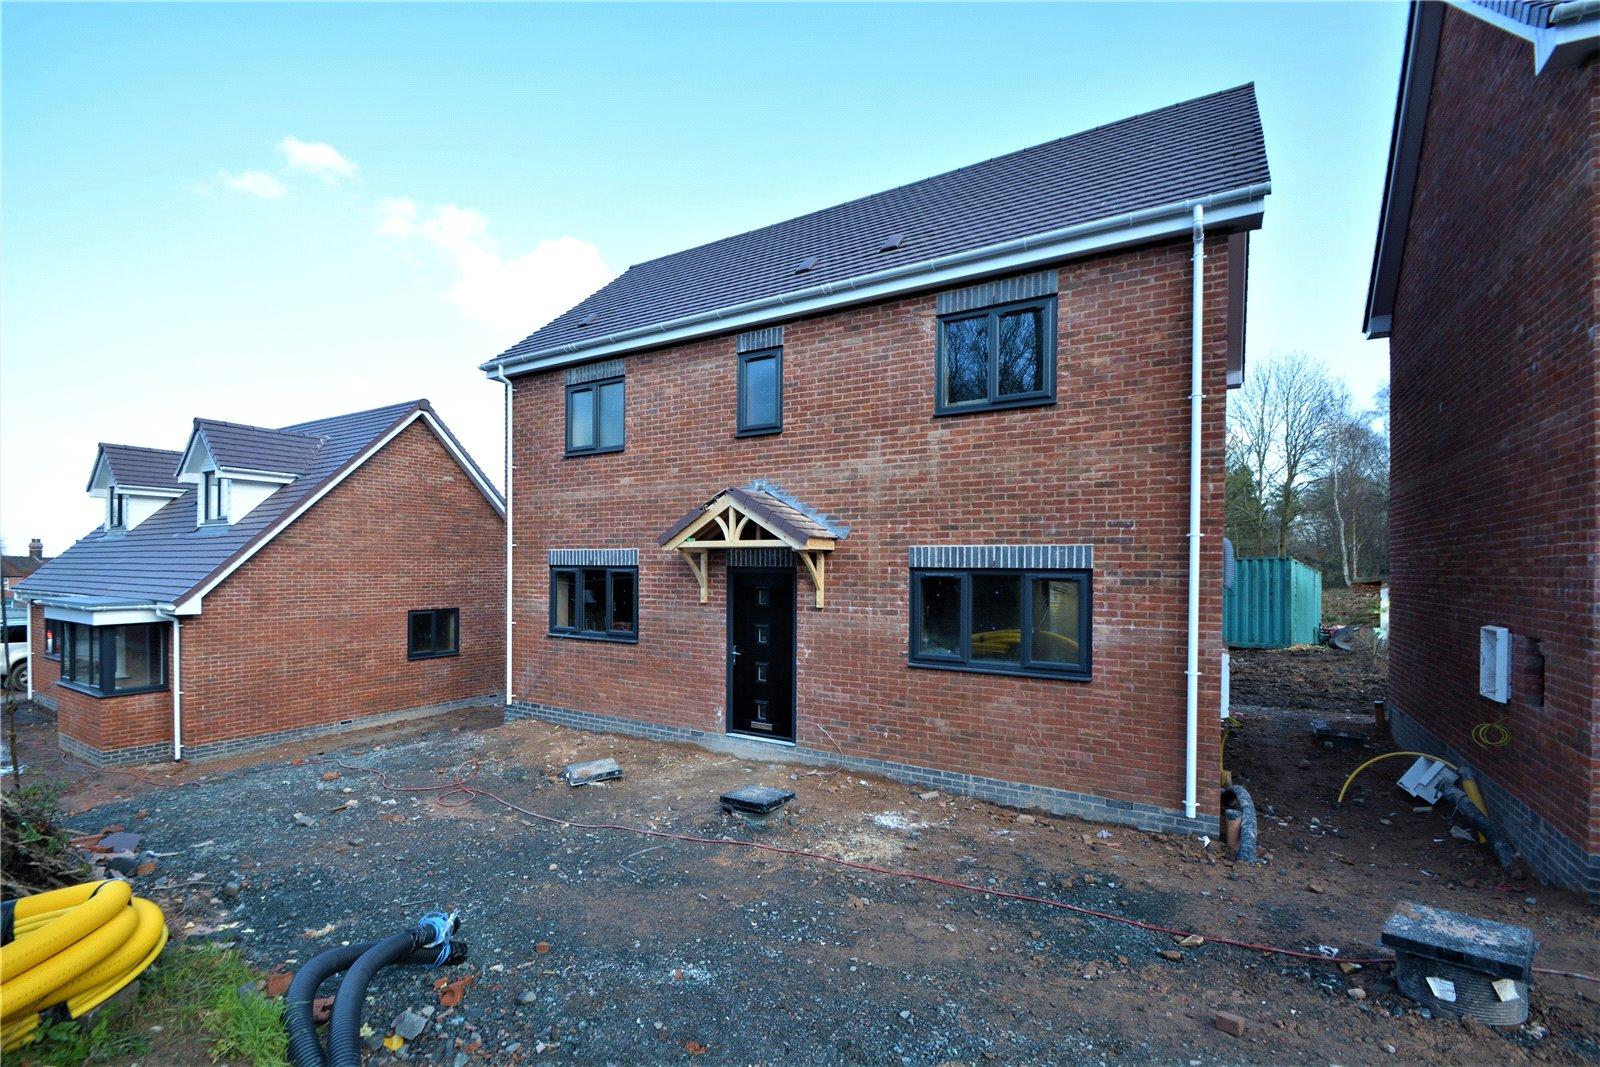 Holly House, Sunnyside Road, Ketley Bank, Telford, Shropshire, TF2